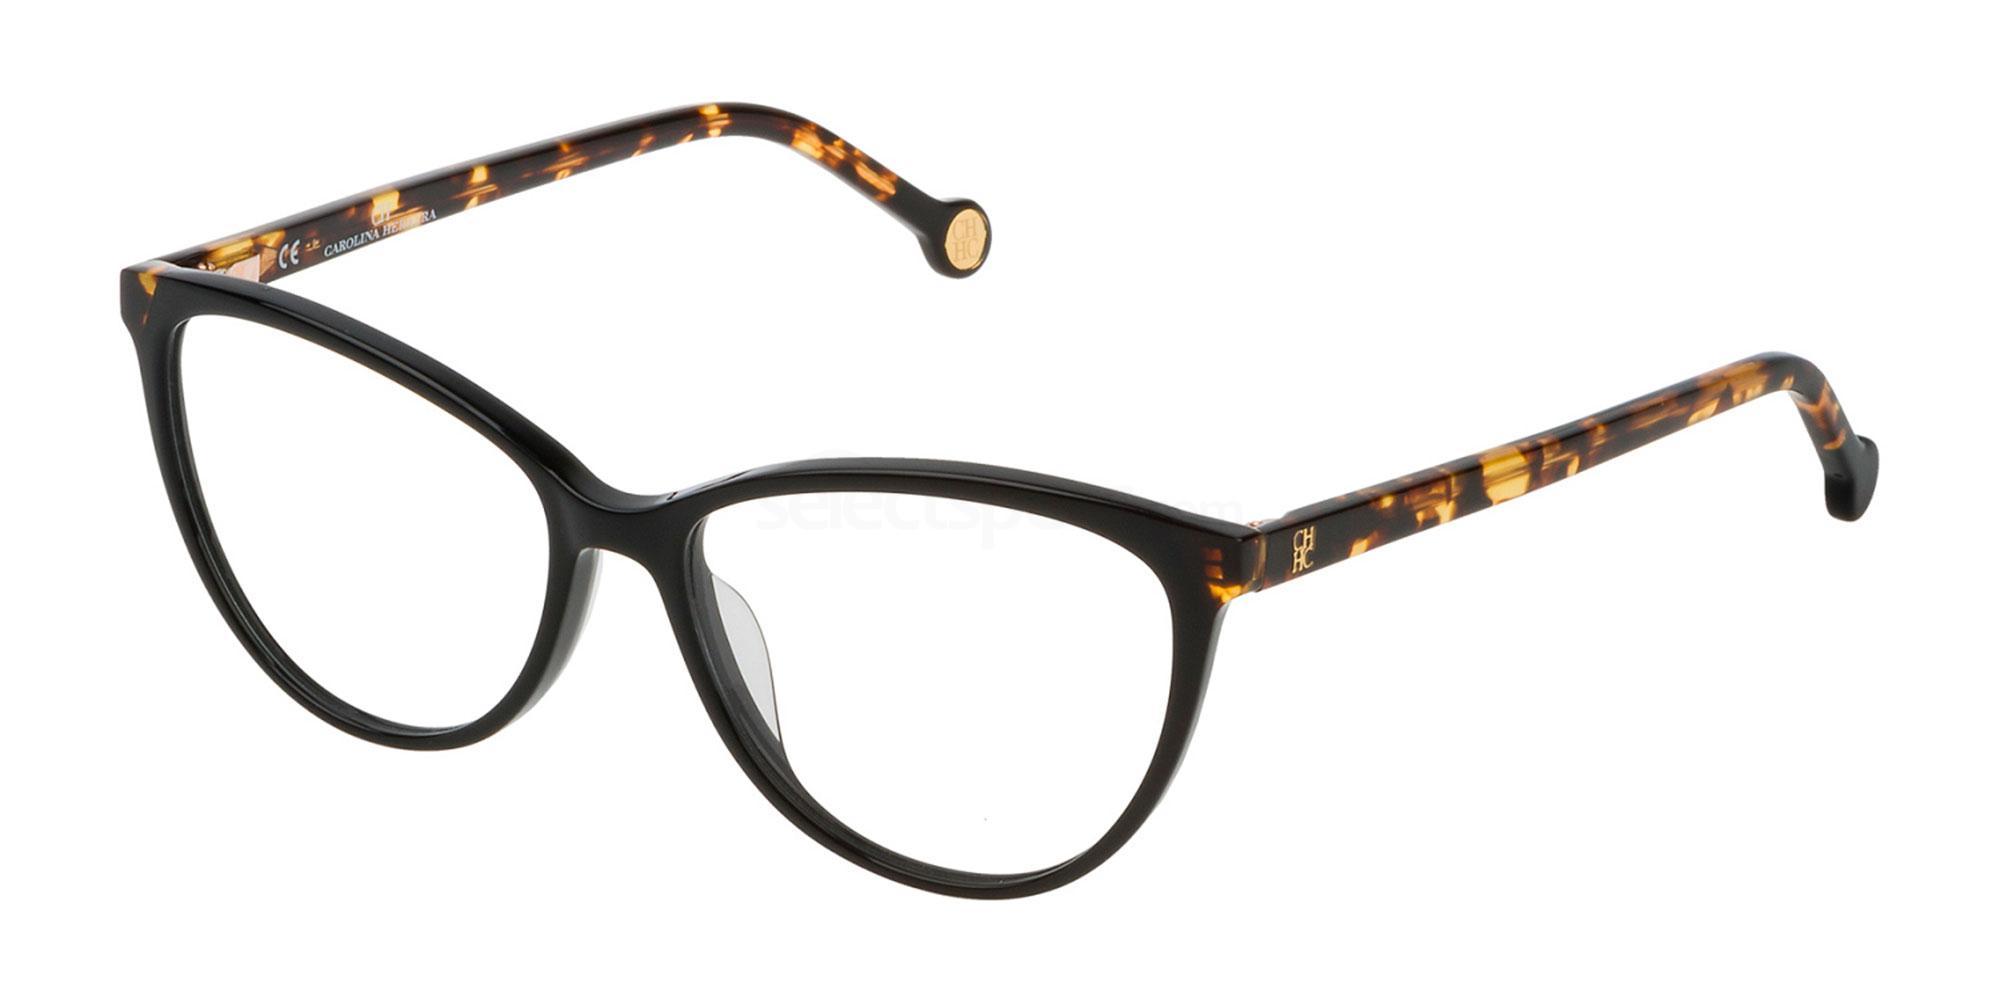 0700 VHE772 Glasses, CH Carolina Herrera